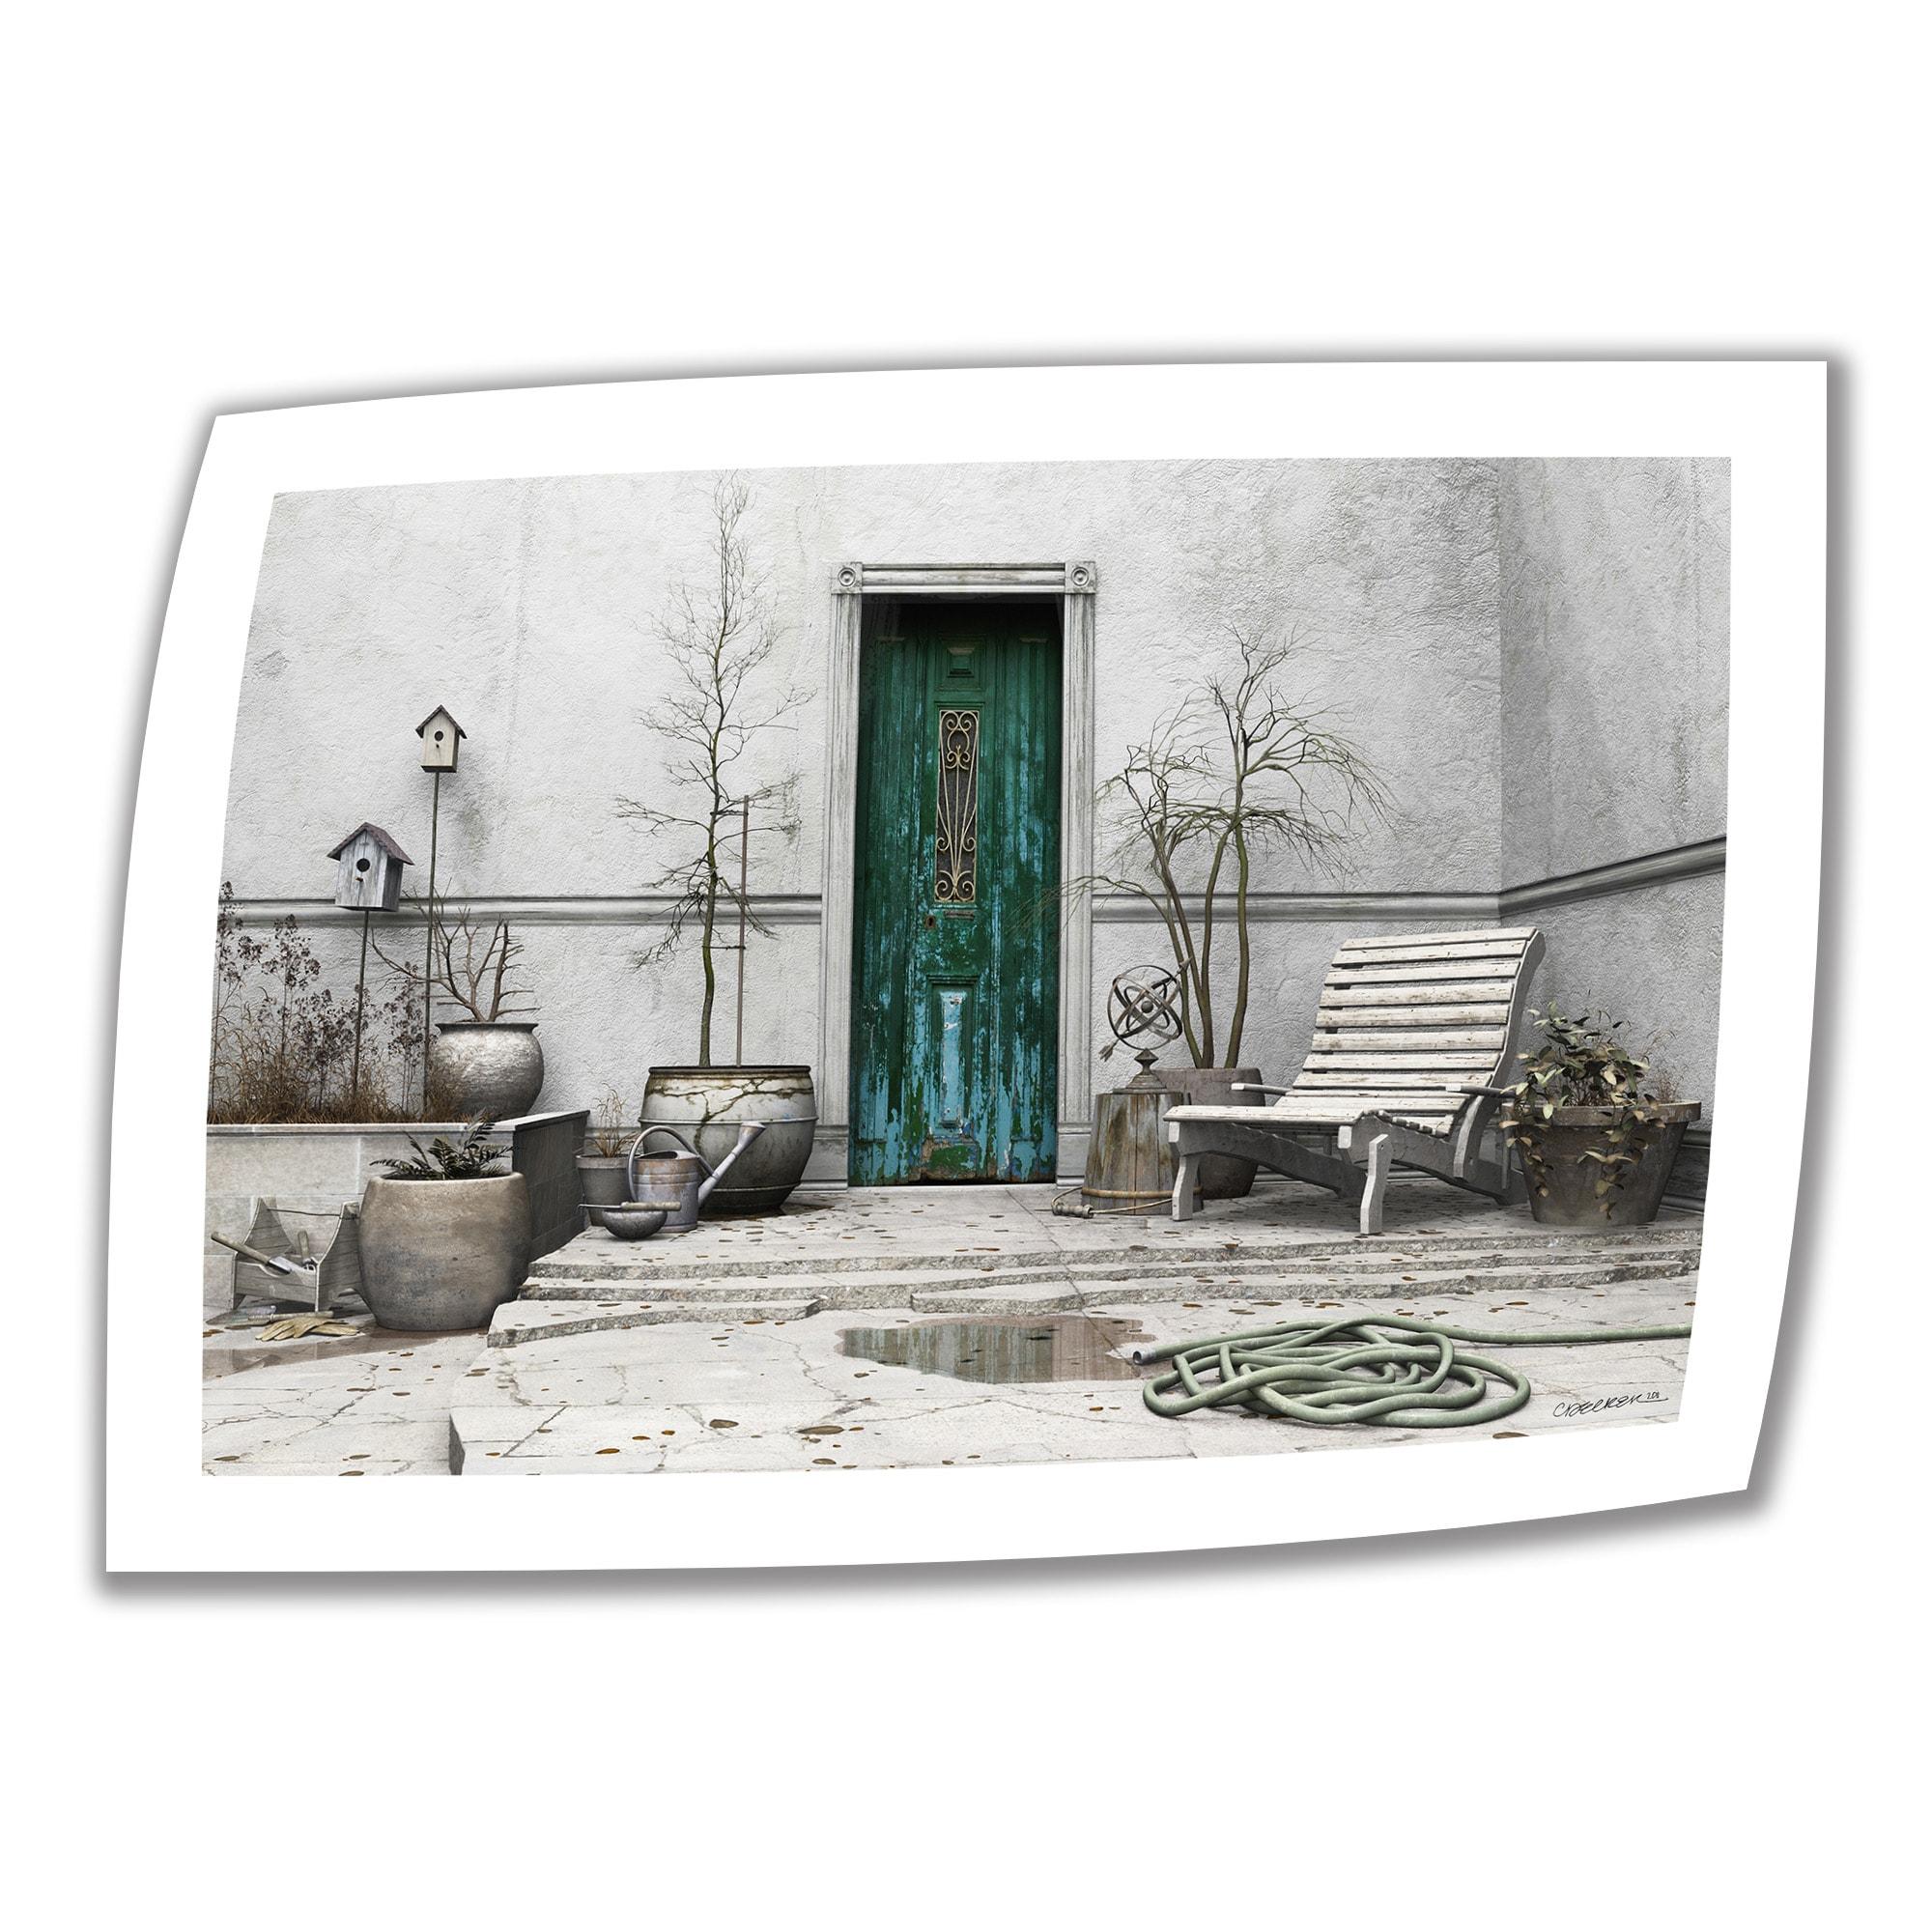 Cynthia Decker \'winter Garden\' Unwrapped Canvas 16x22 Image 12x18 | eBay